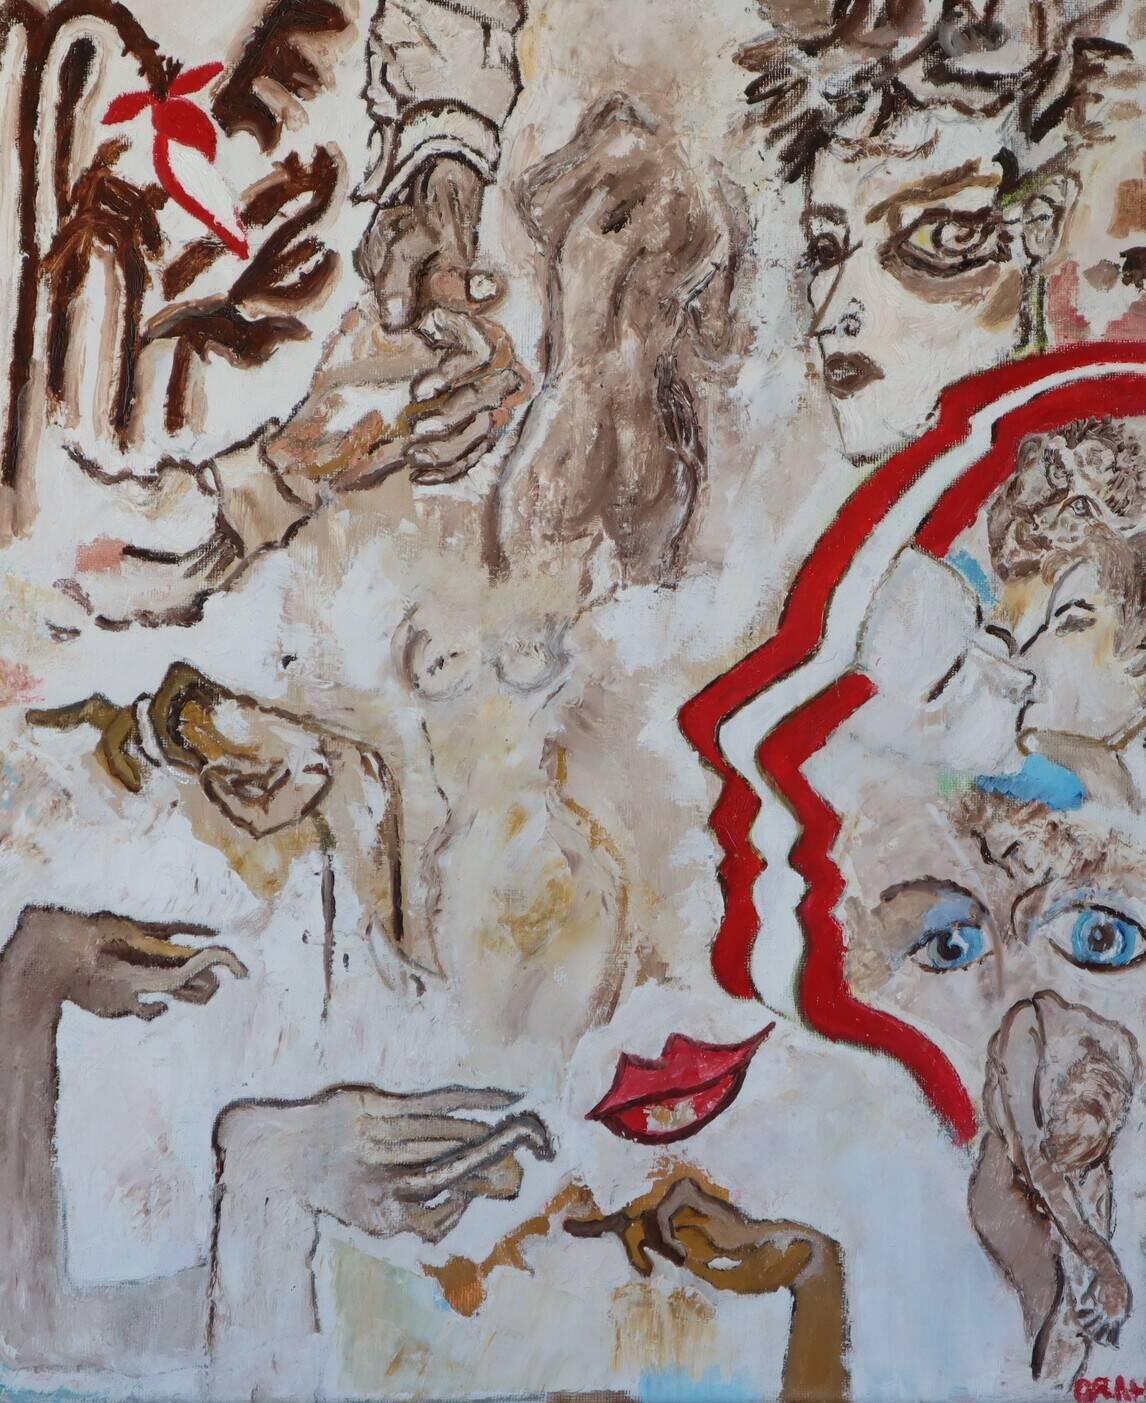 with Egon Schiele